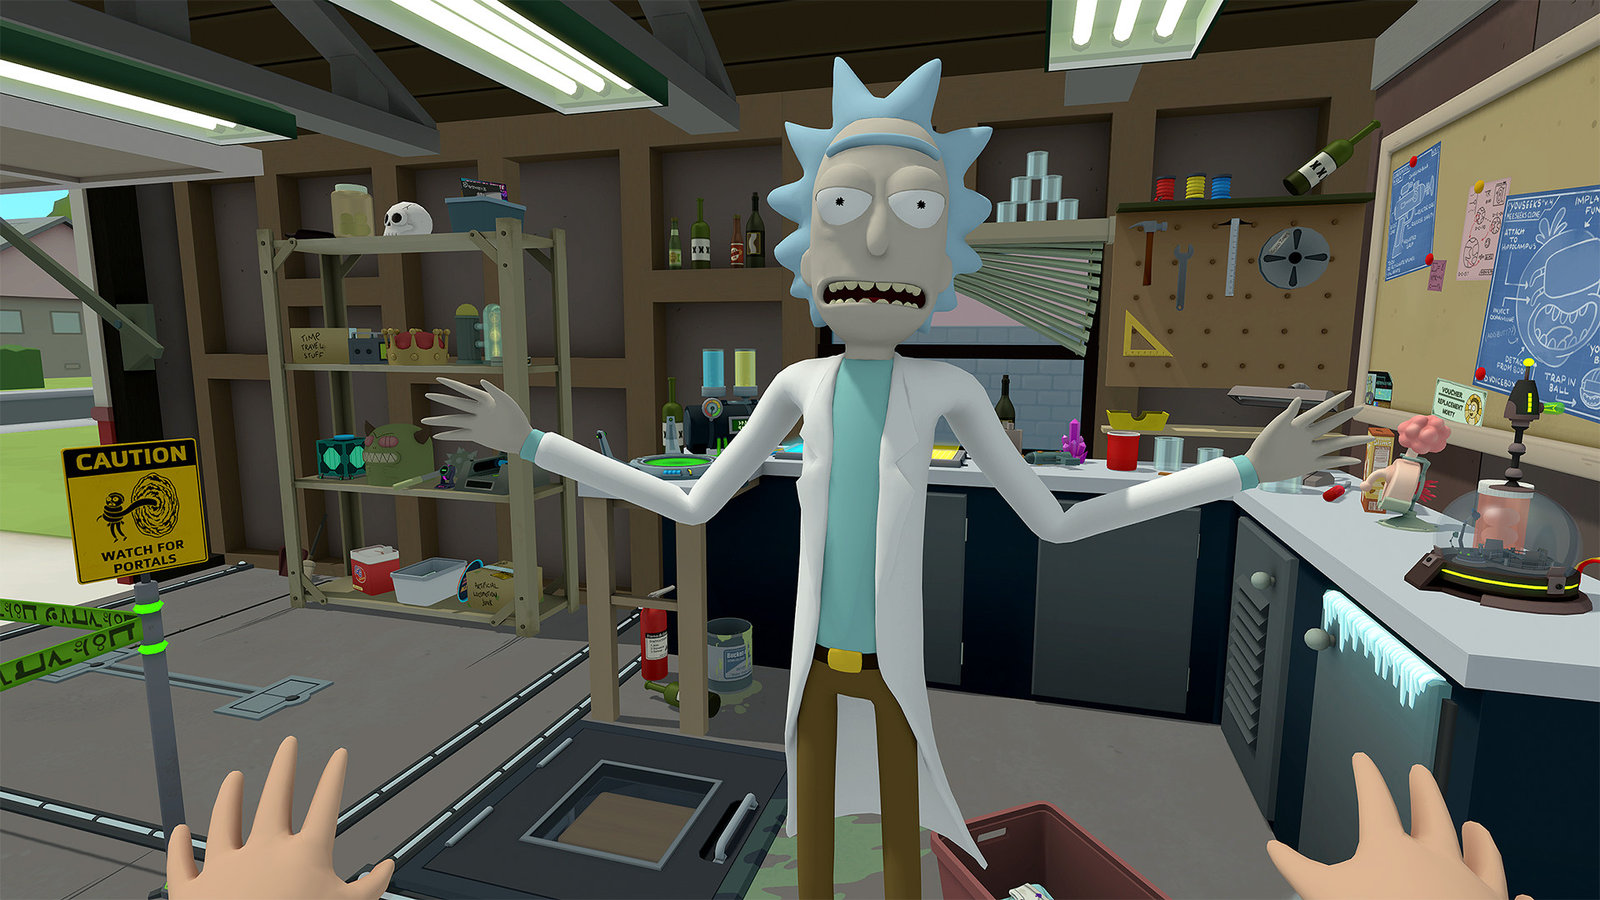 Rick and Morty: Virtual Rick-ality image 1